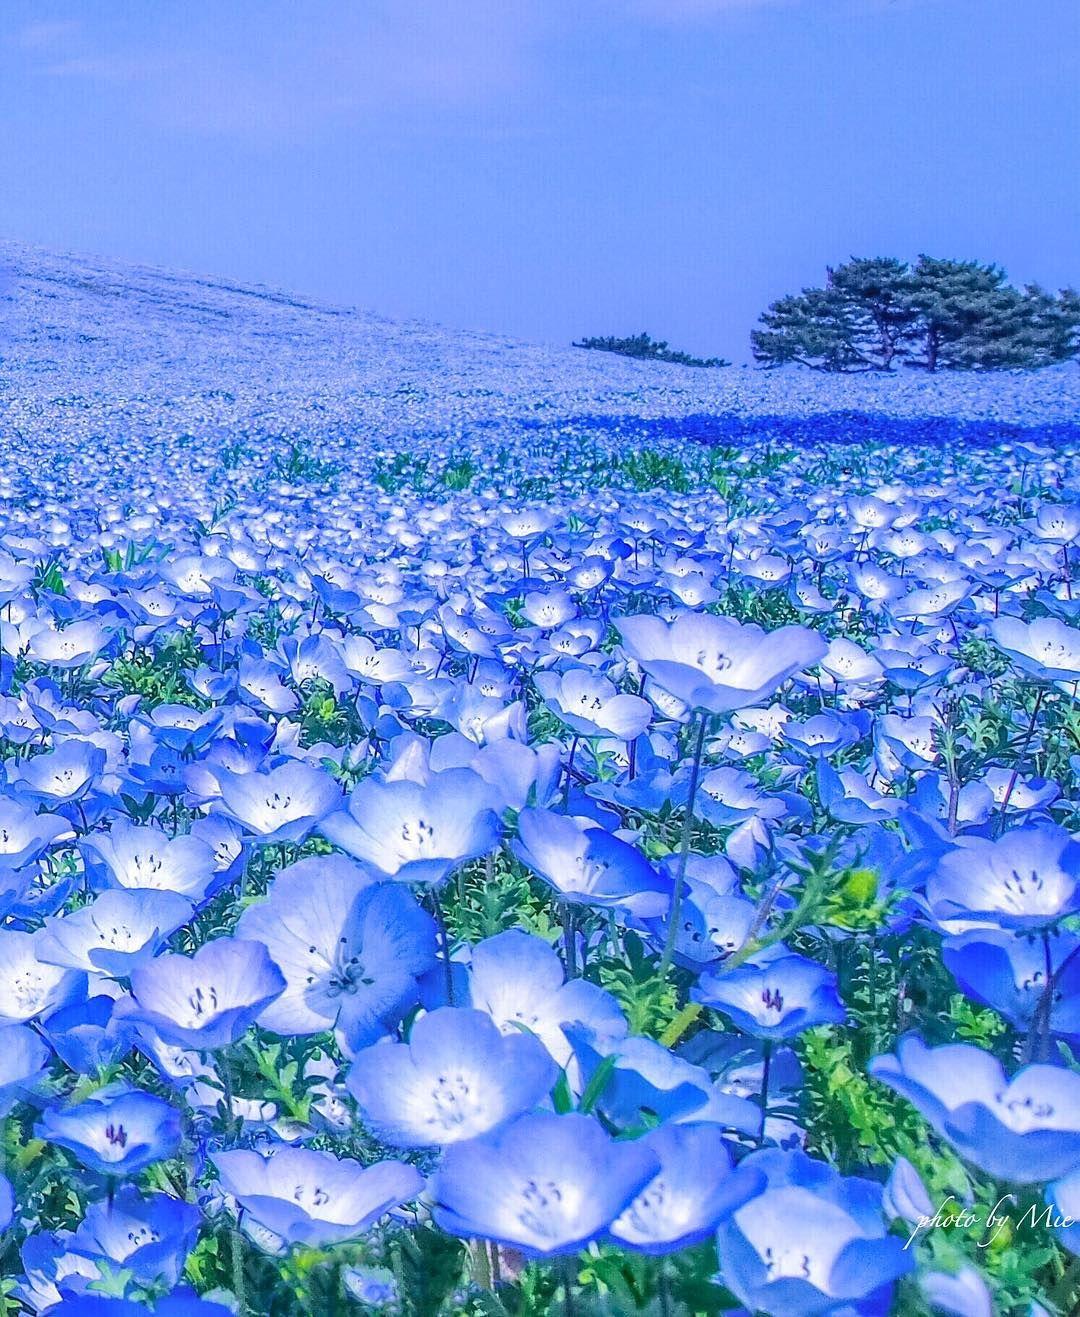 Blue Hill Nemophila Hitachi Seaside Park Japan By